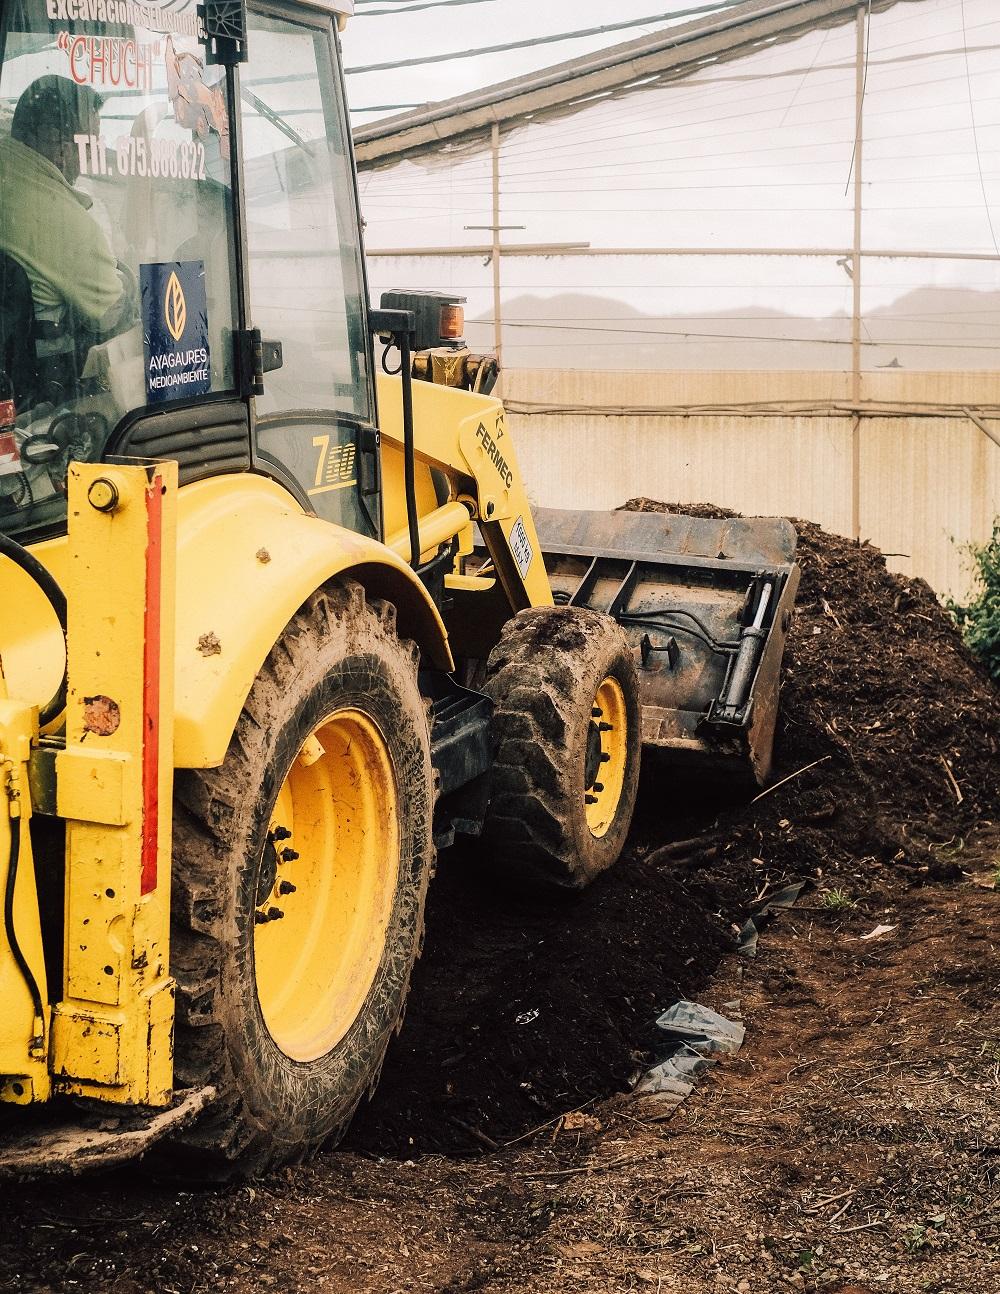 operario municipal conduce máquina manipulando compost